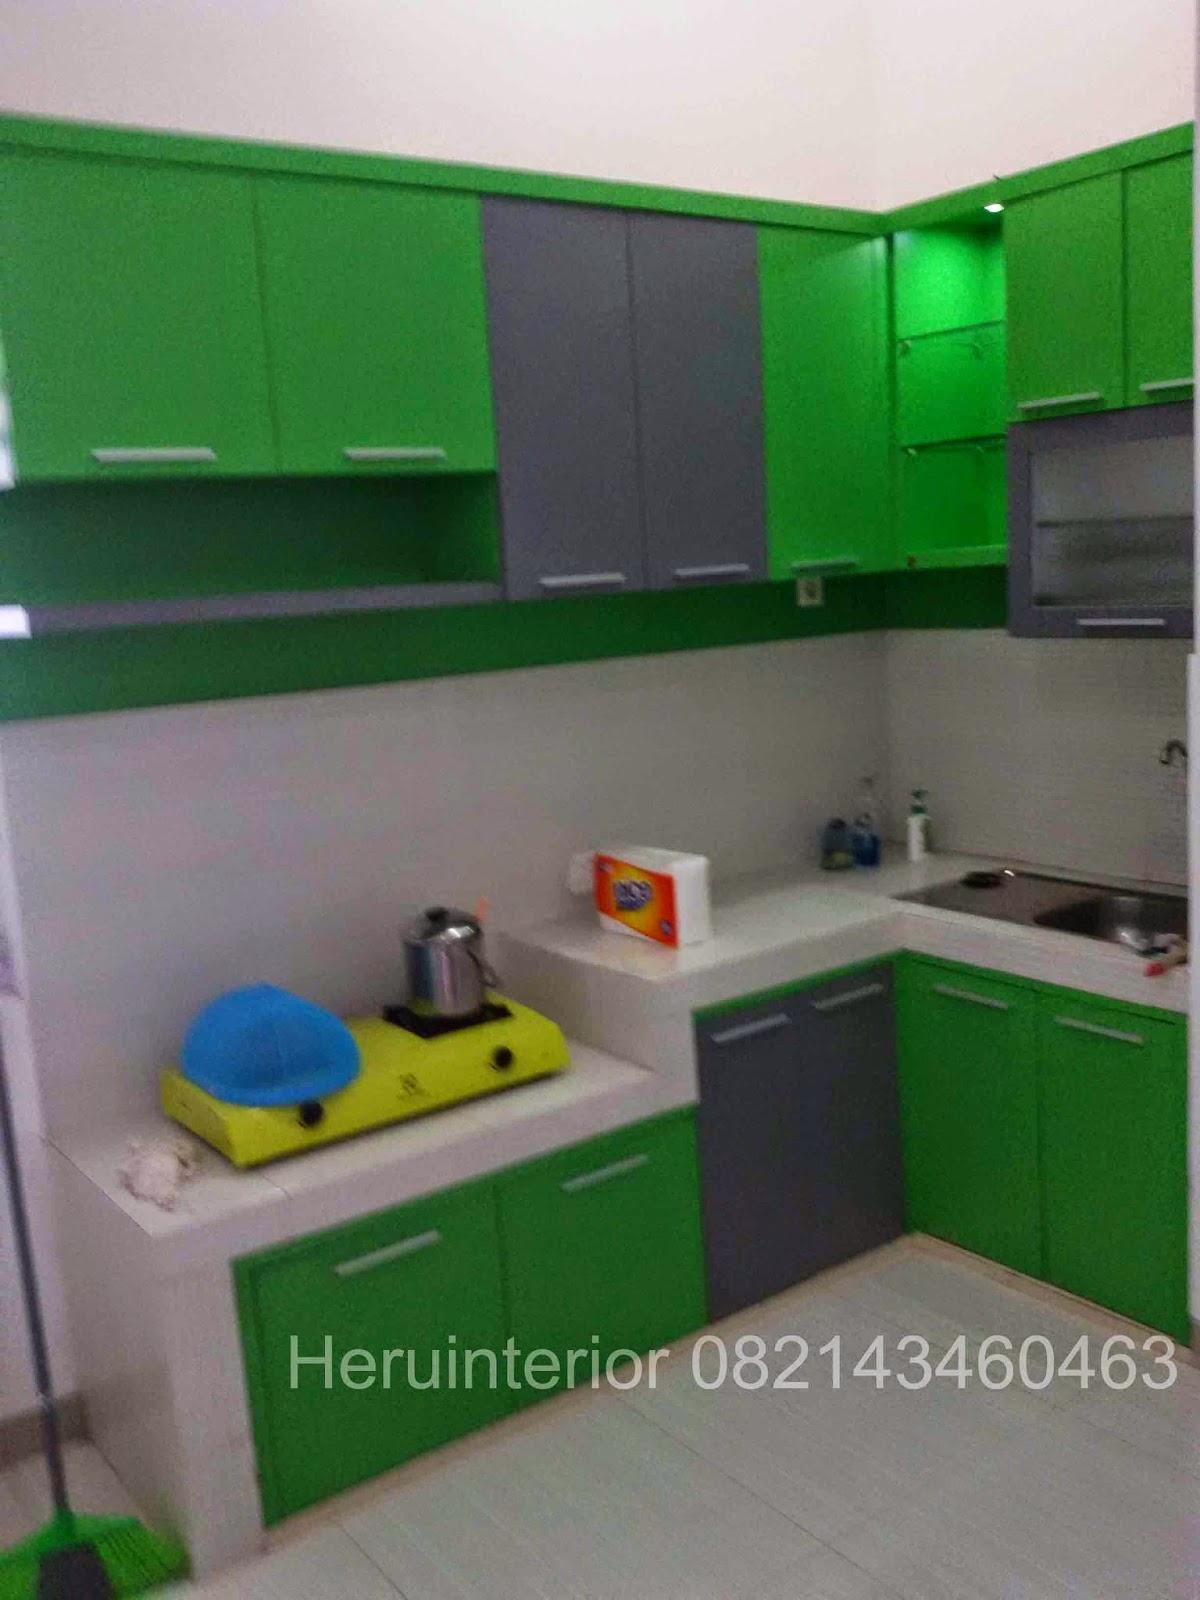 Desain Kitchen Set Warna Hijau